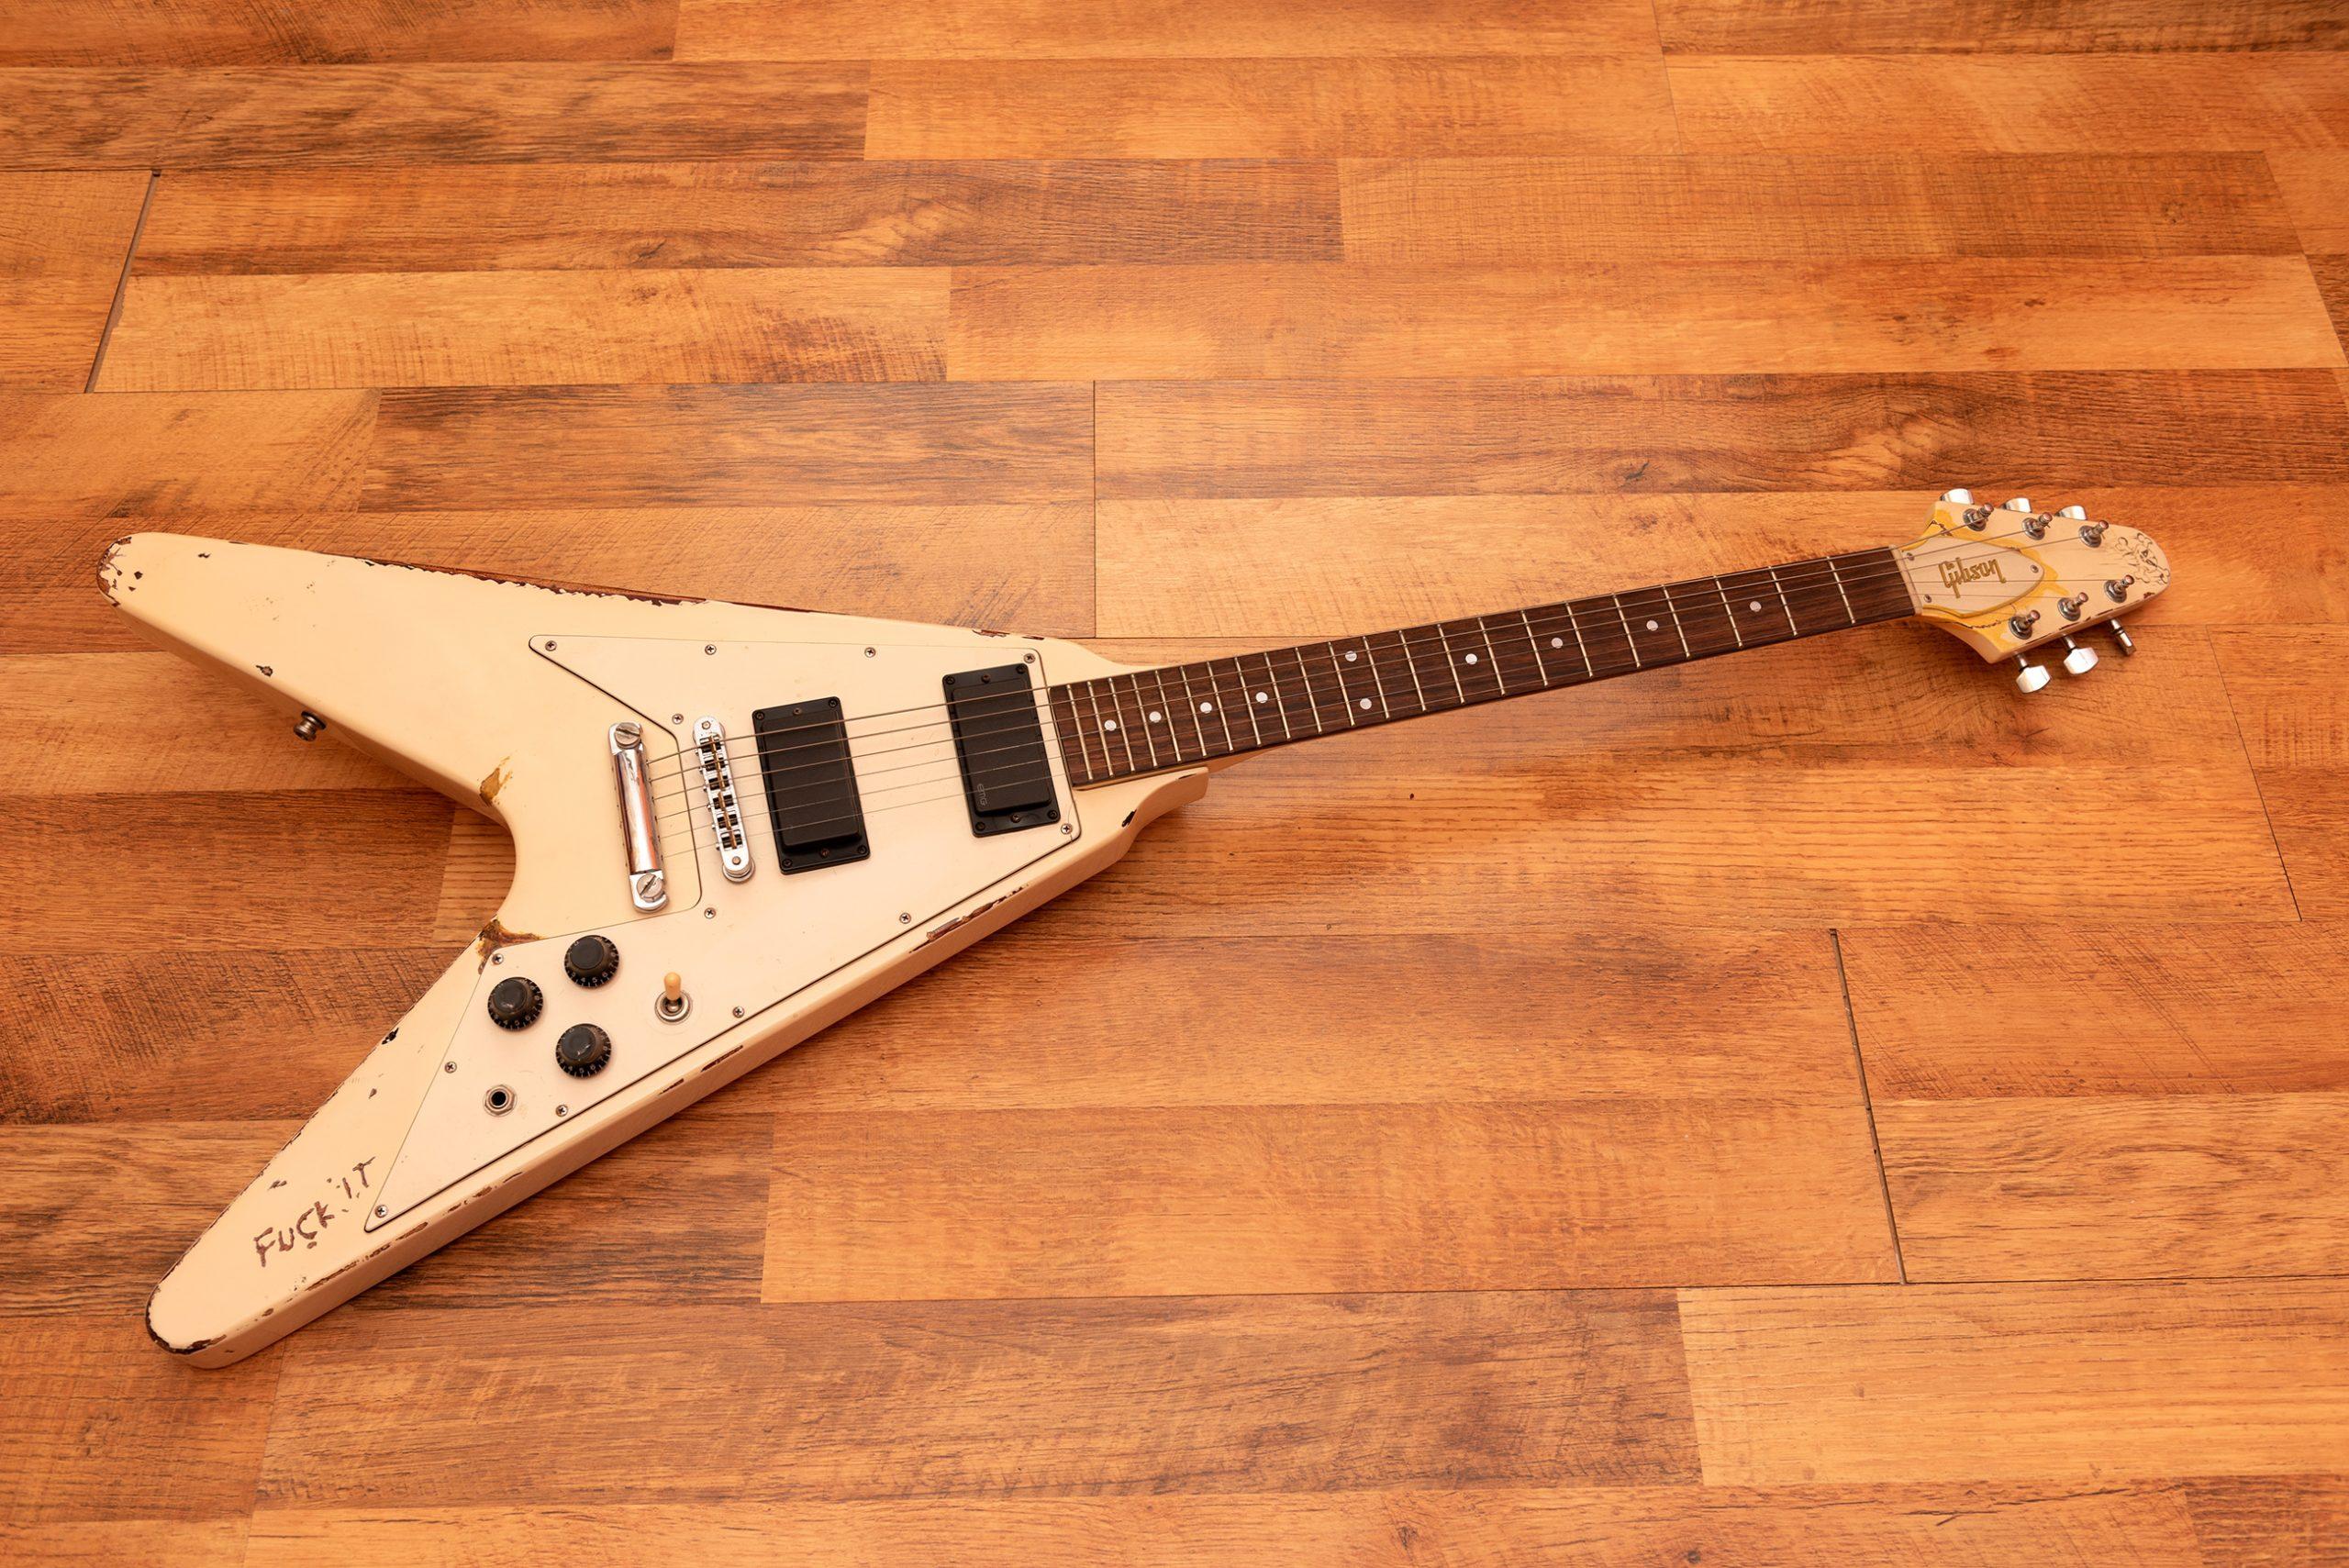 James Hetfield's white Electra Kill 'Em All Flying V